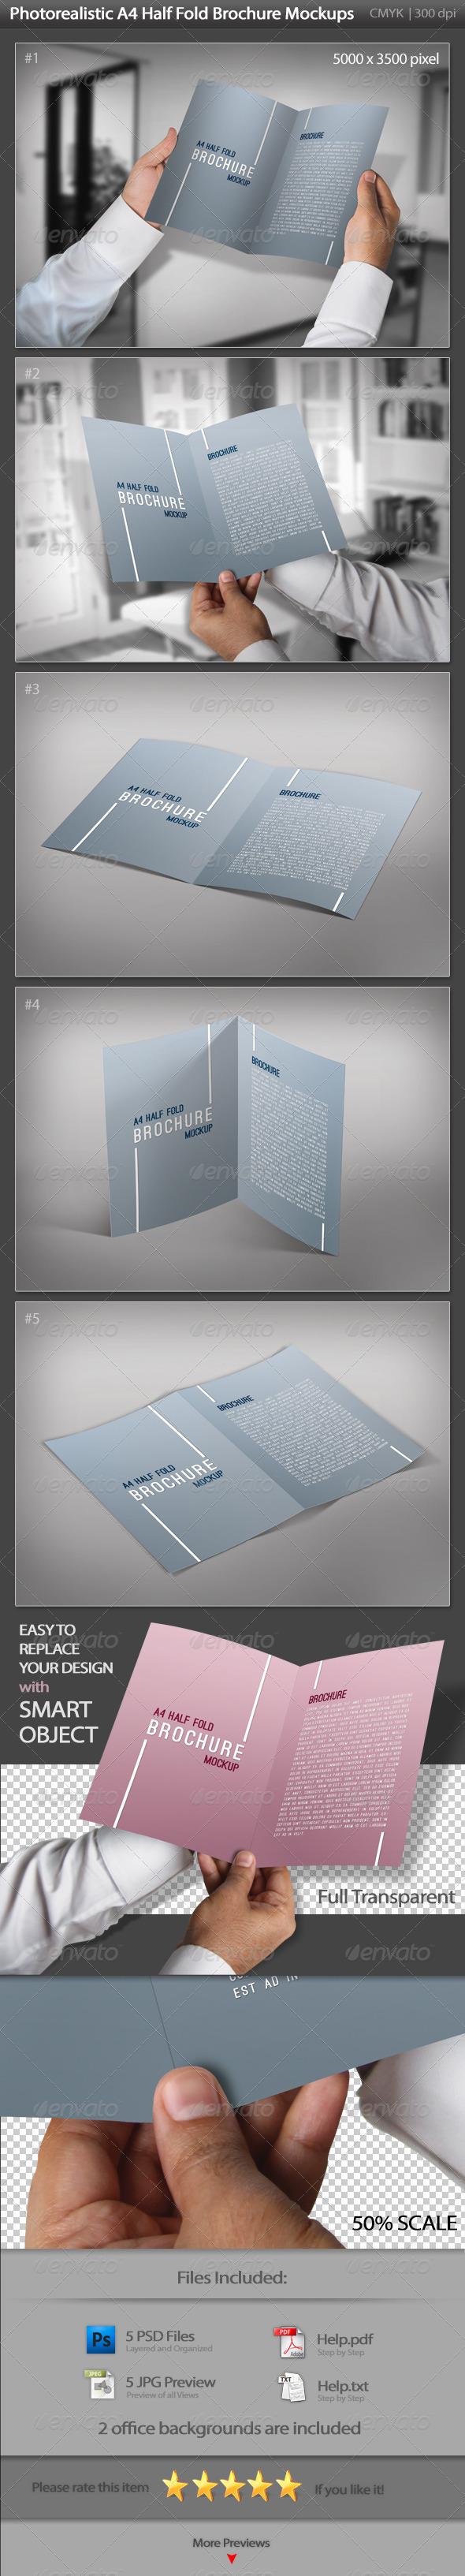 GraphicRiver A4 Half Fold Brochure Mockups 3437424